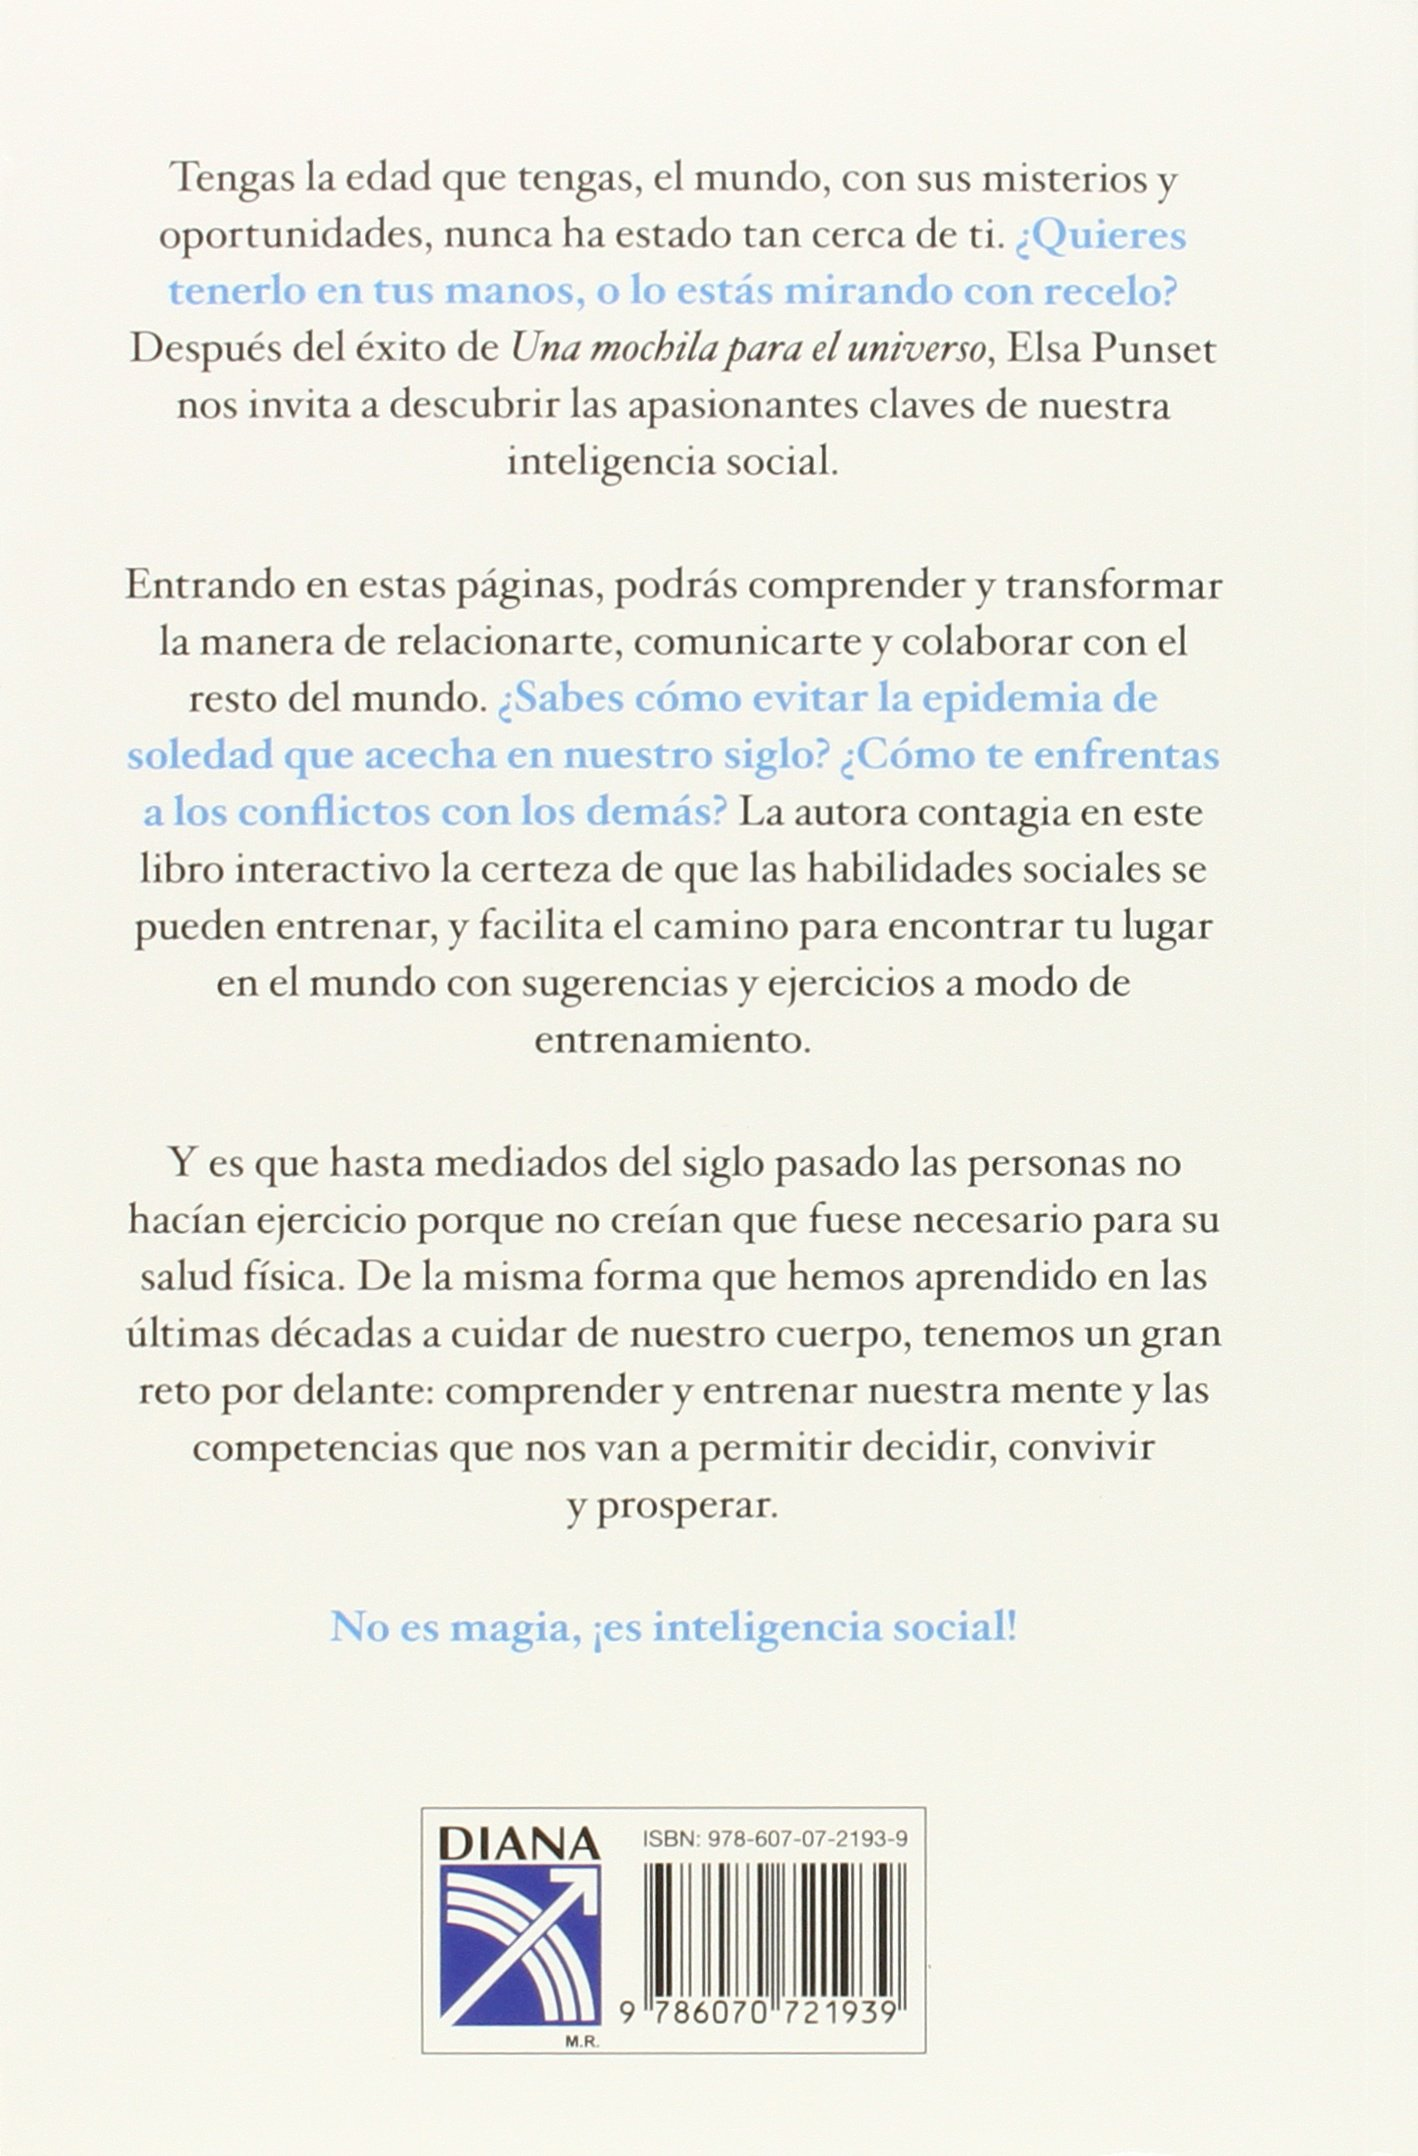 El mundo en tus manos (Spanish Edition): Elsa Punset: 9786070721939: Amazon.com: Books